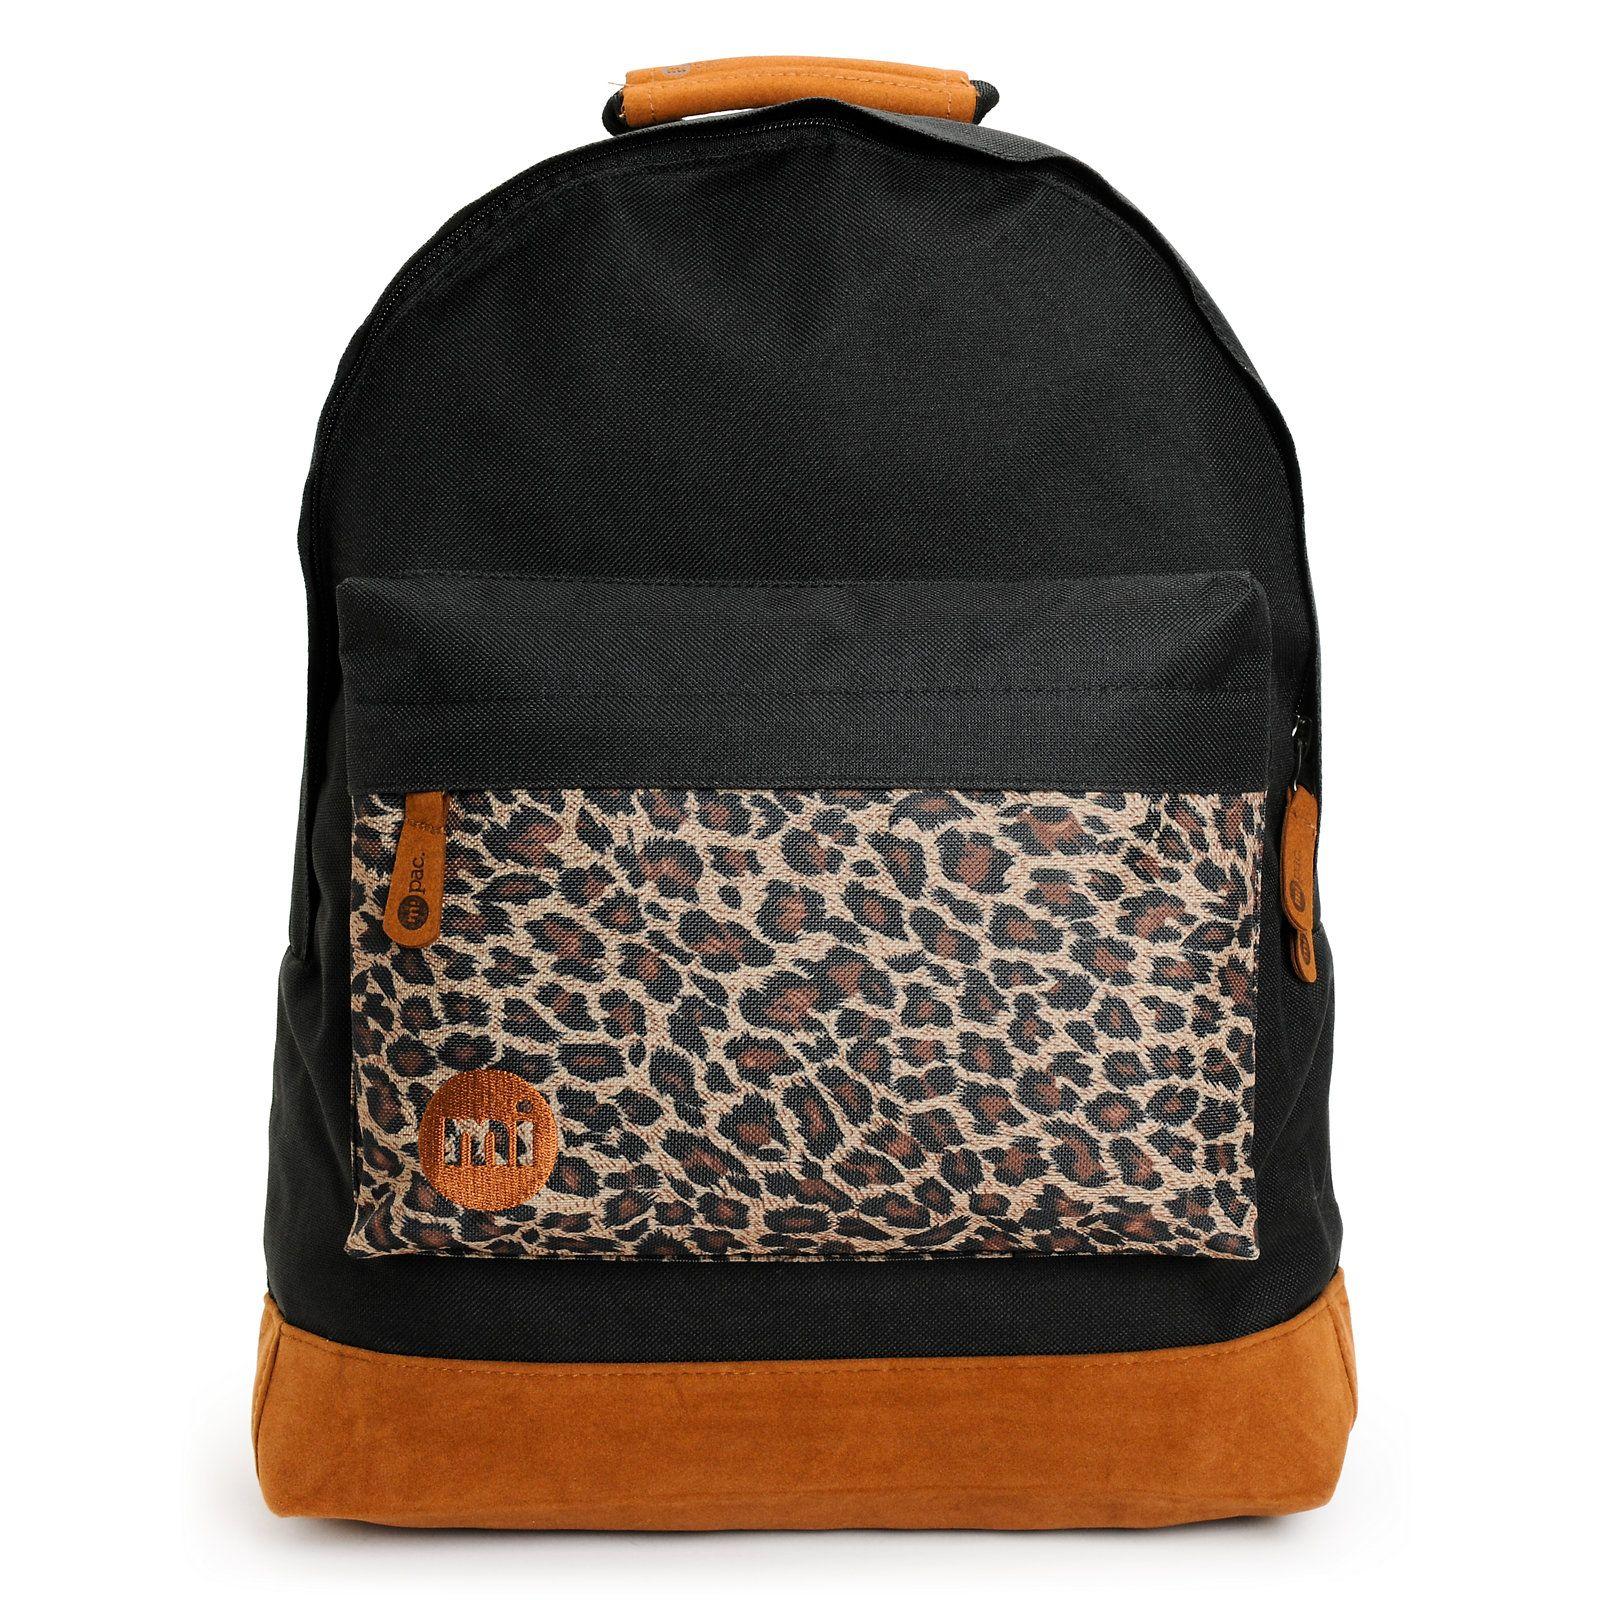 Mipac black u leopard backpack leopards backpacks and black body